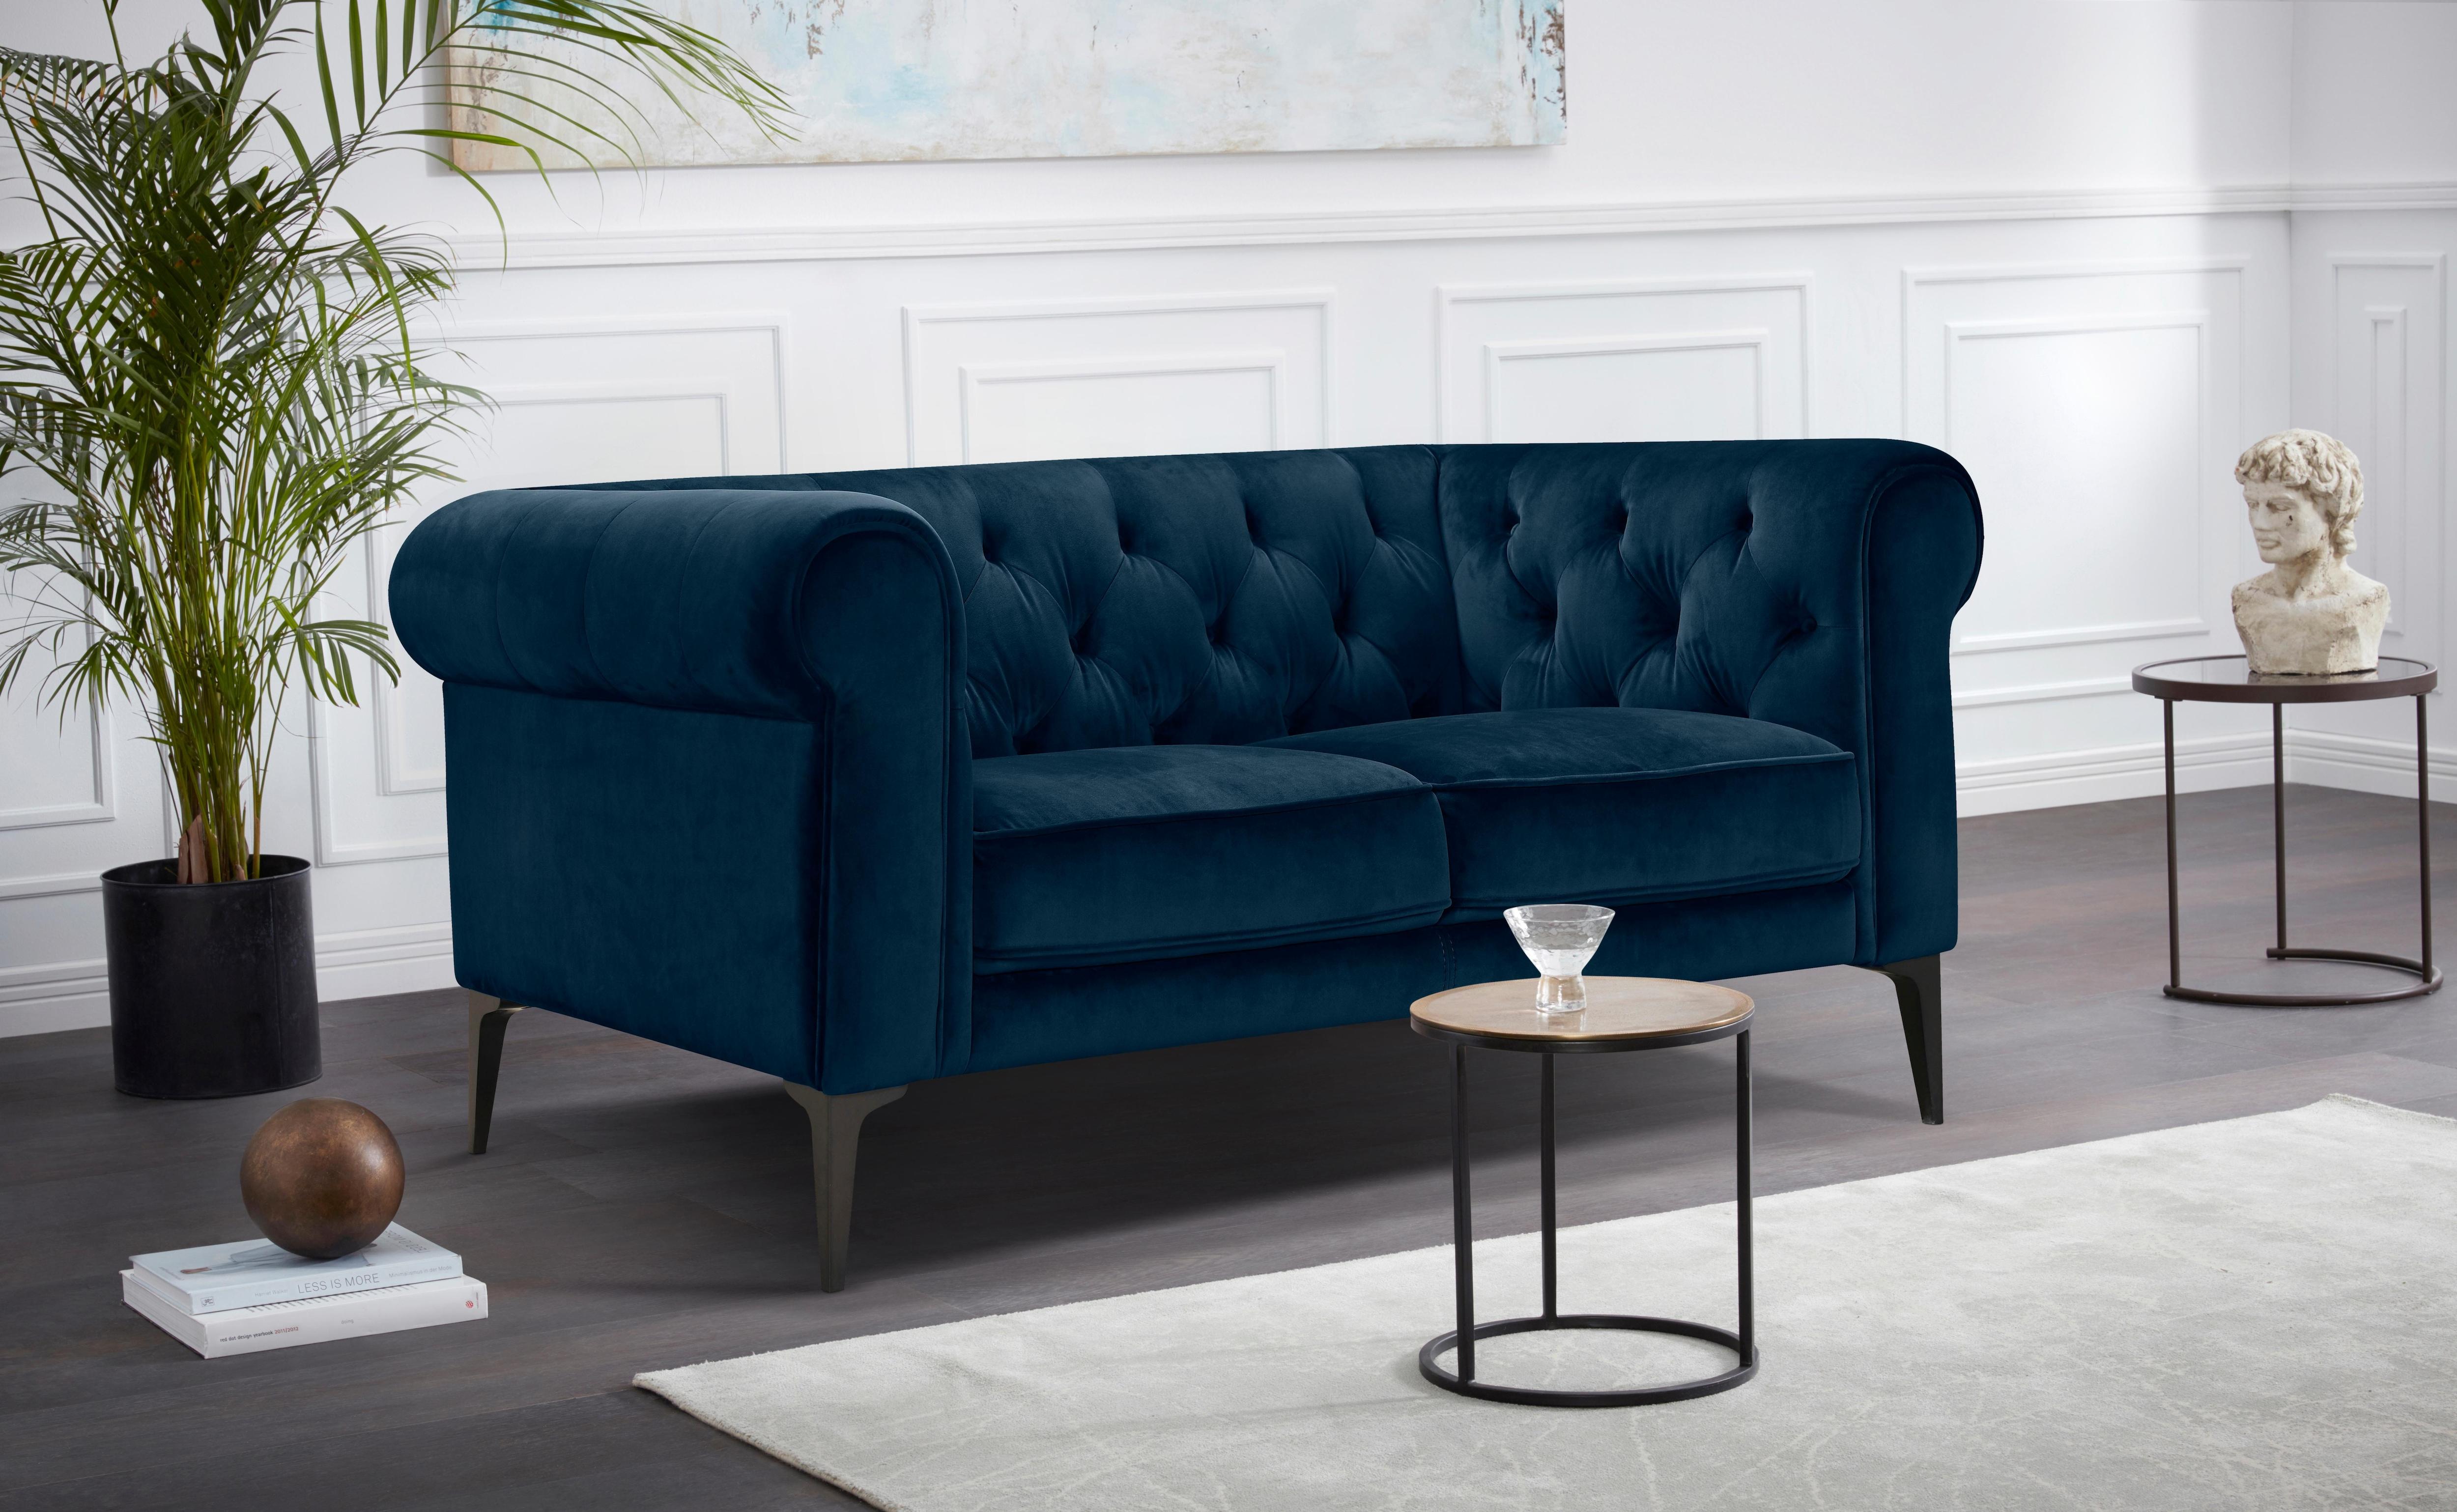 Premium collection by Home affaire 2-Sitzer Tobol